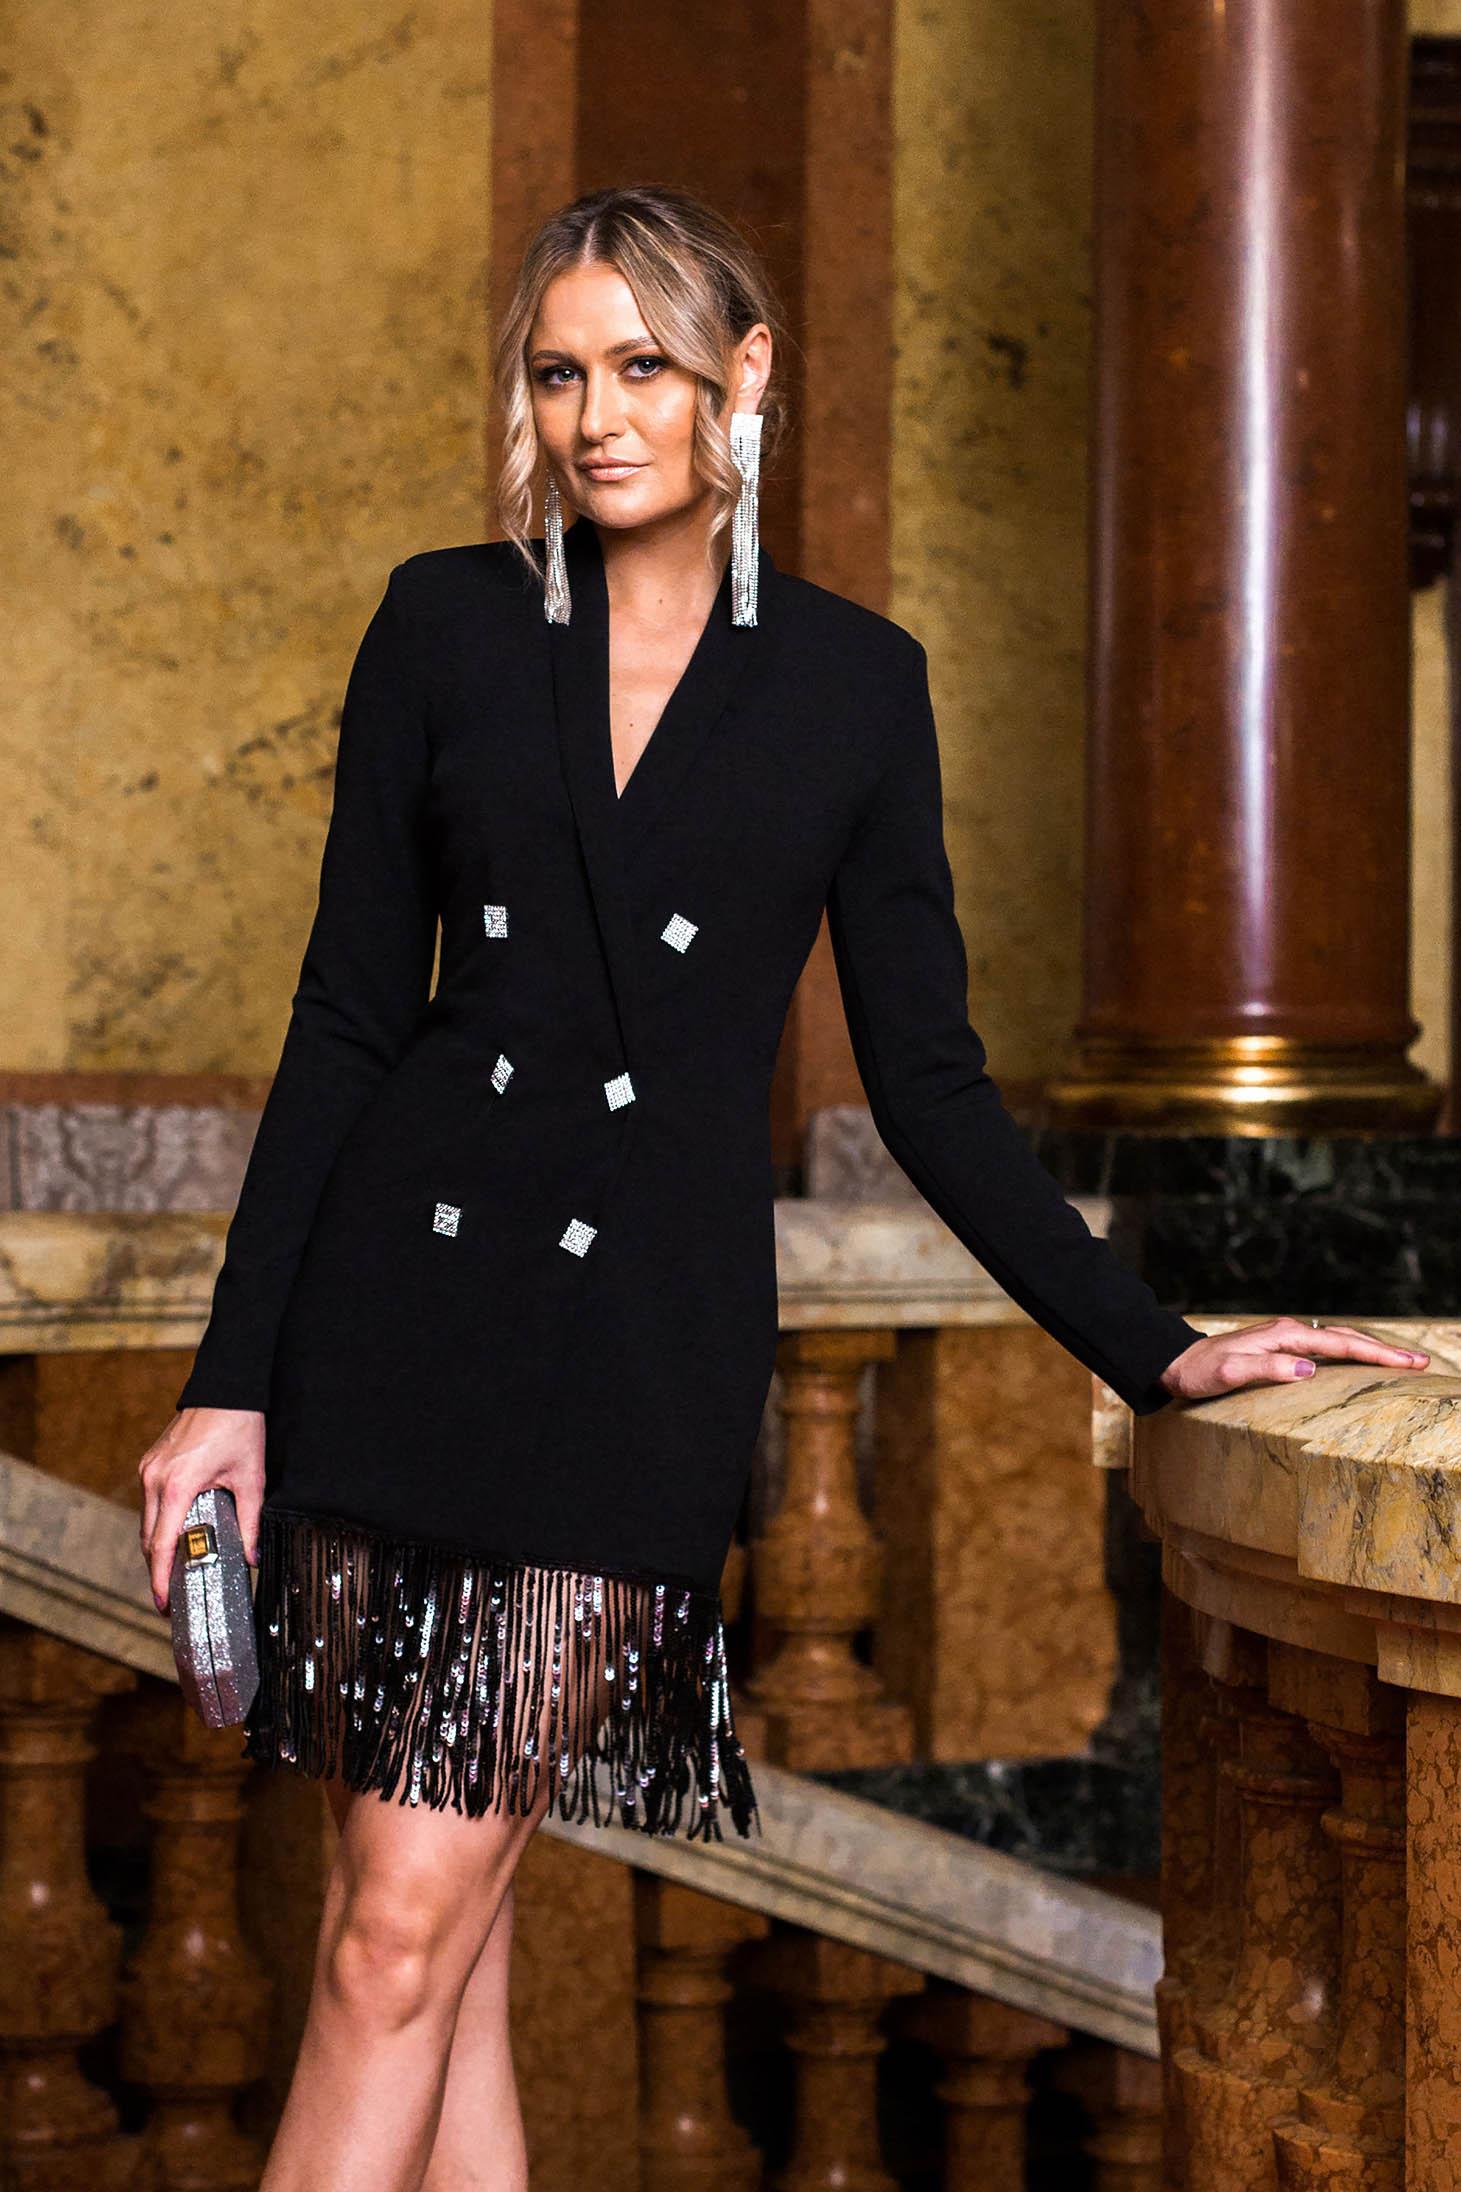 Rochie neagra PrettyGirl rochie pentru femei de ocazie cu un croi drept